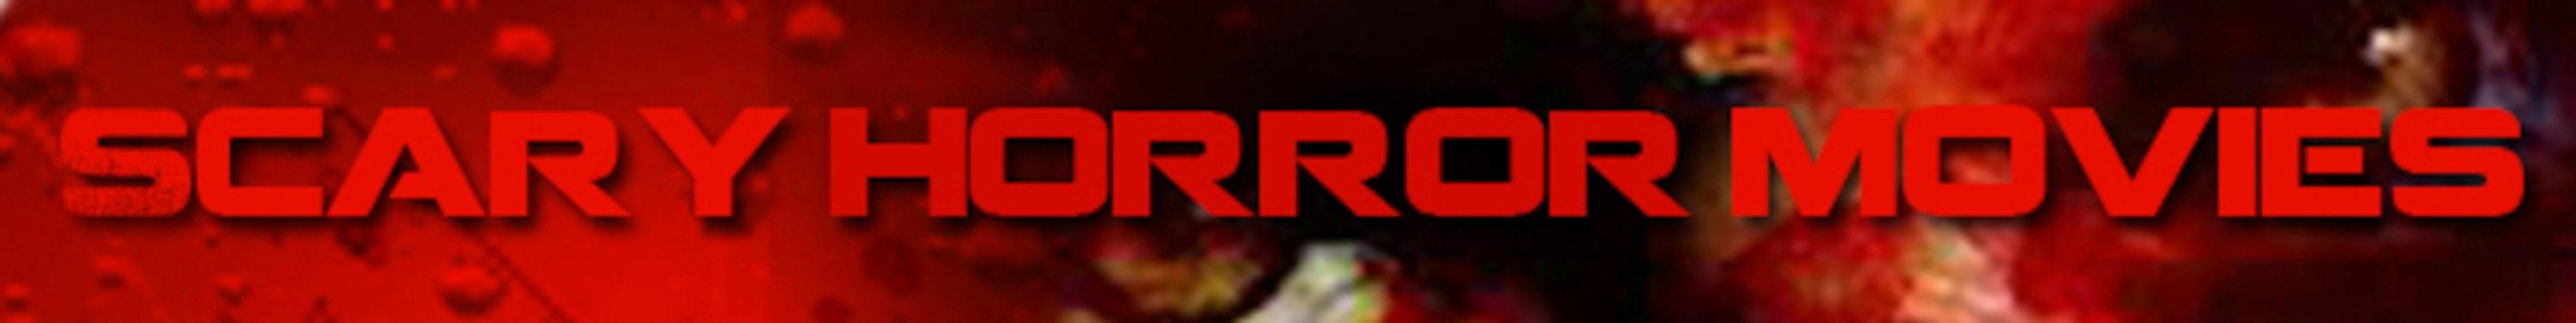 ScaryHorrorMovies